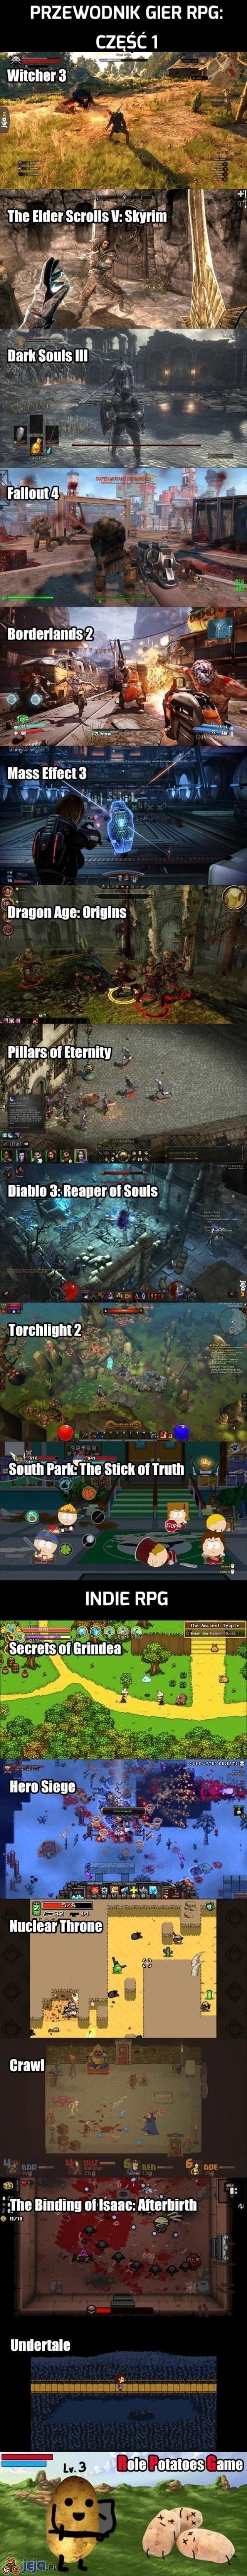 Przewodnik gier RPG